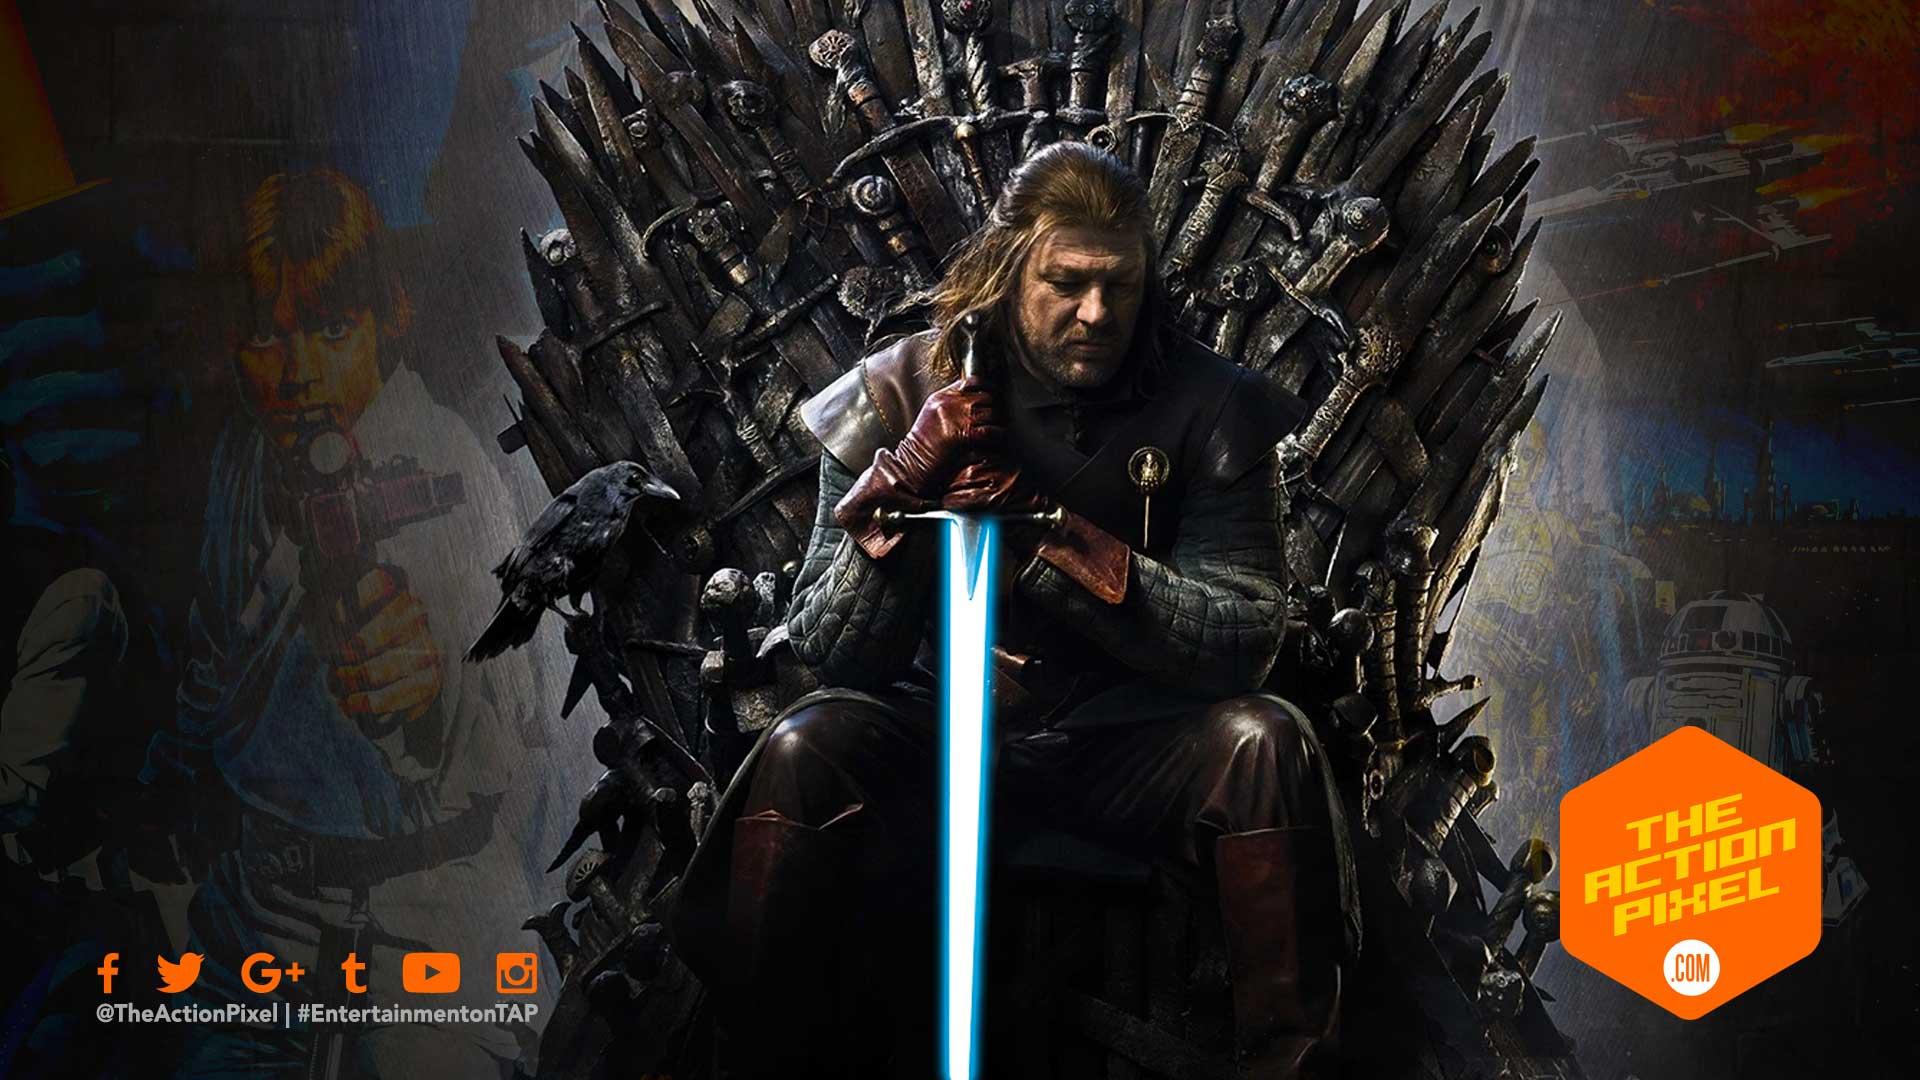 star wars,David Benioff,D.B. Weiss, bob iger, game of thrones, star wars trilogy , rian johnson, star wars, star wars: rise of the skywalker , entertainment on tap, disney, featured,